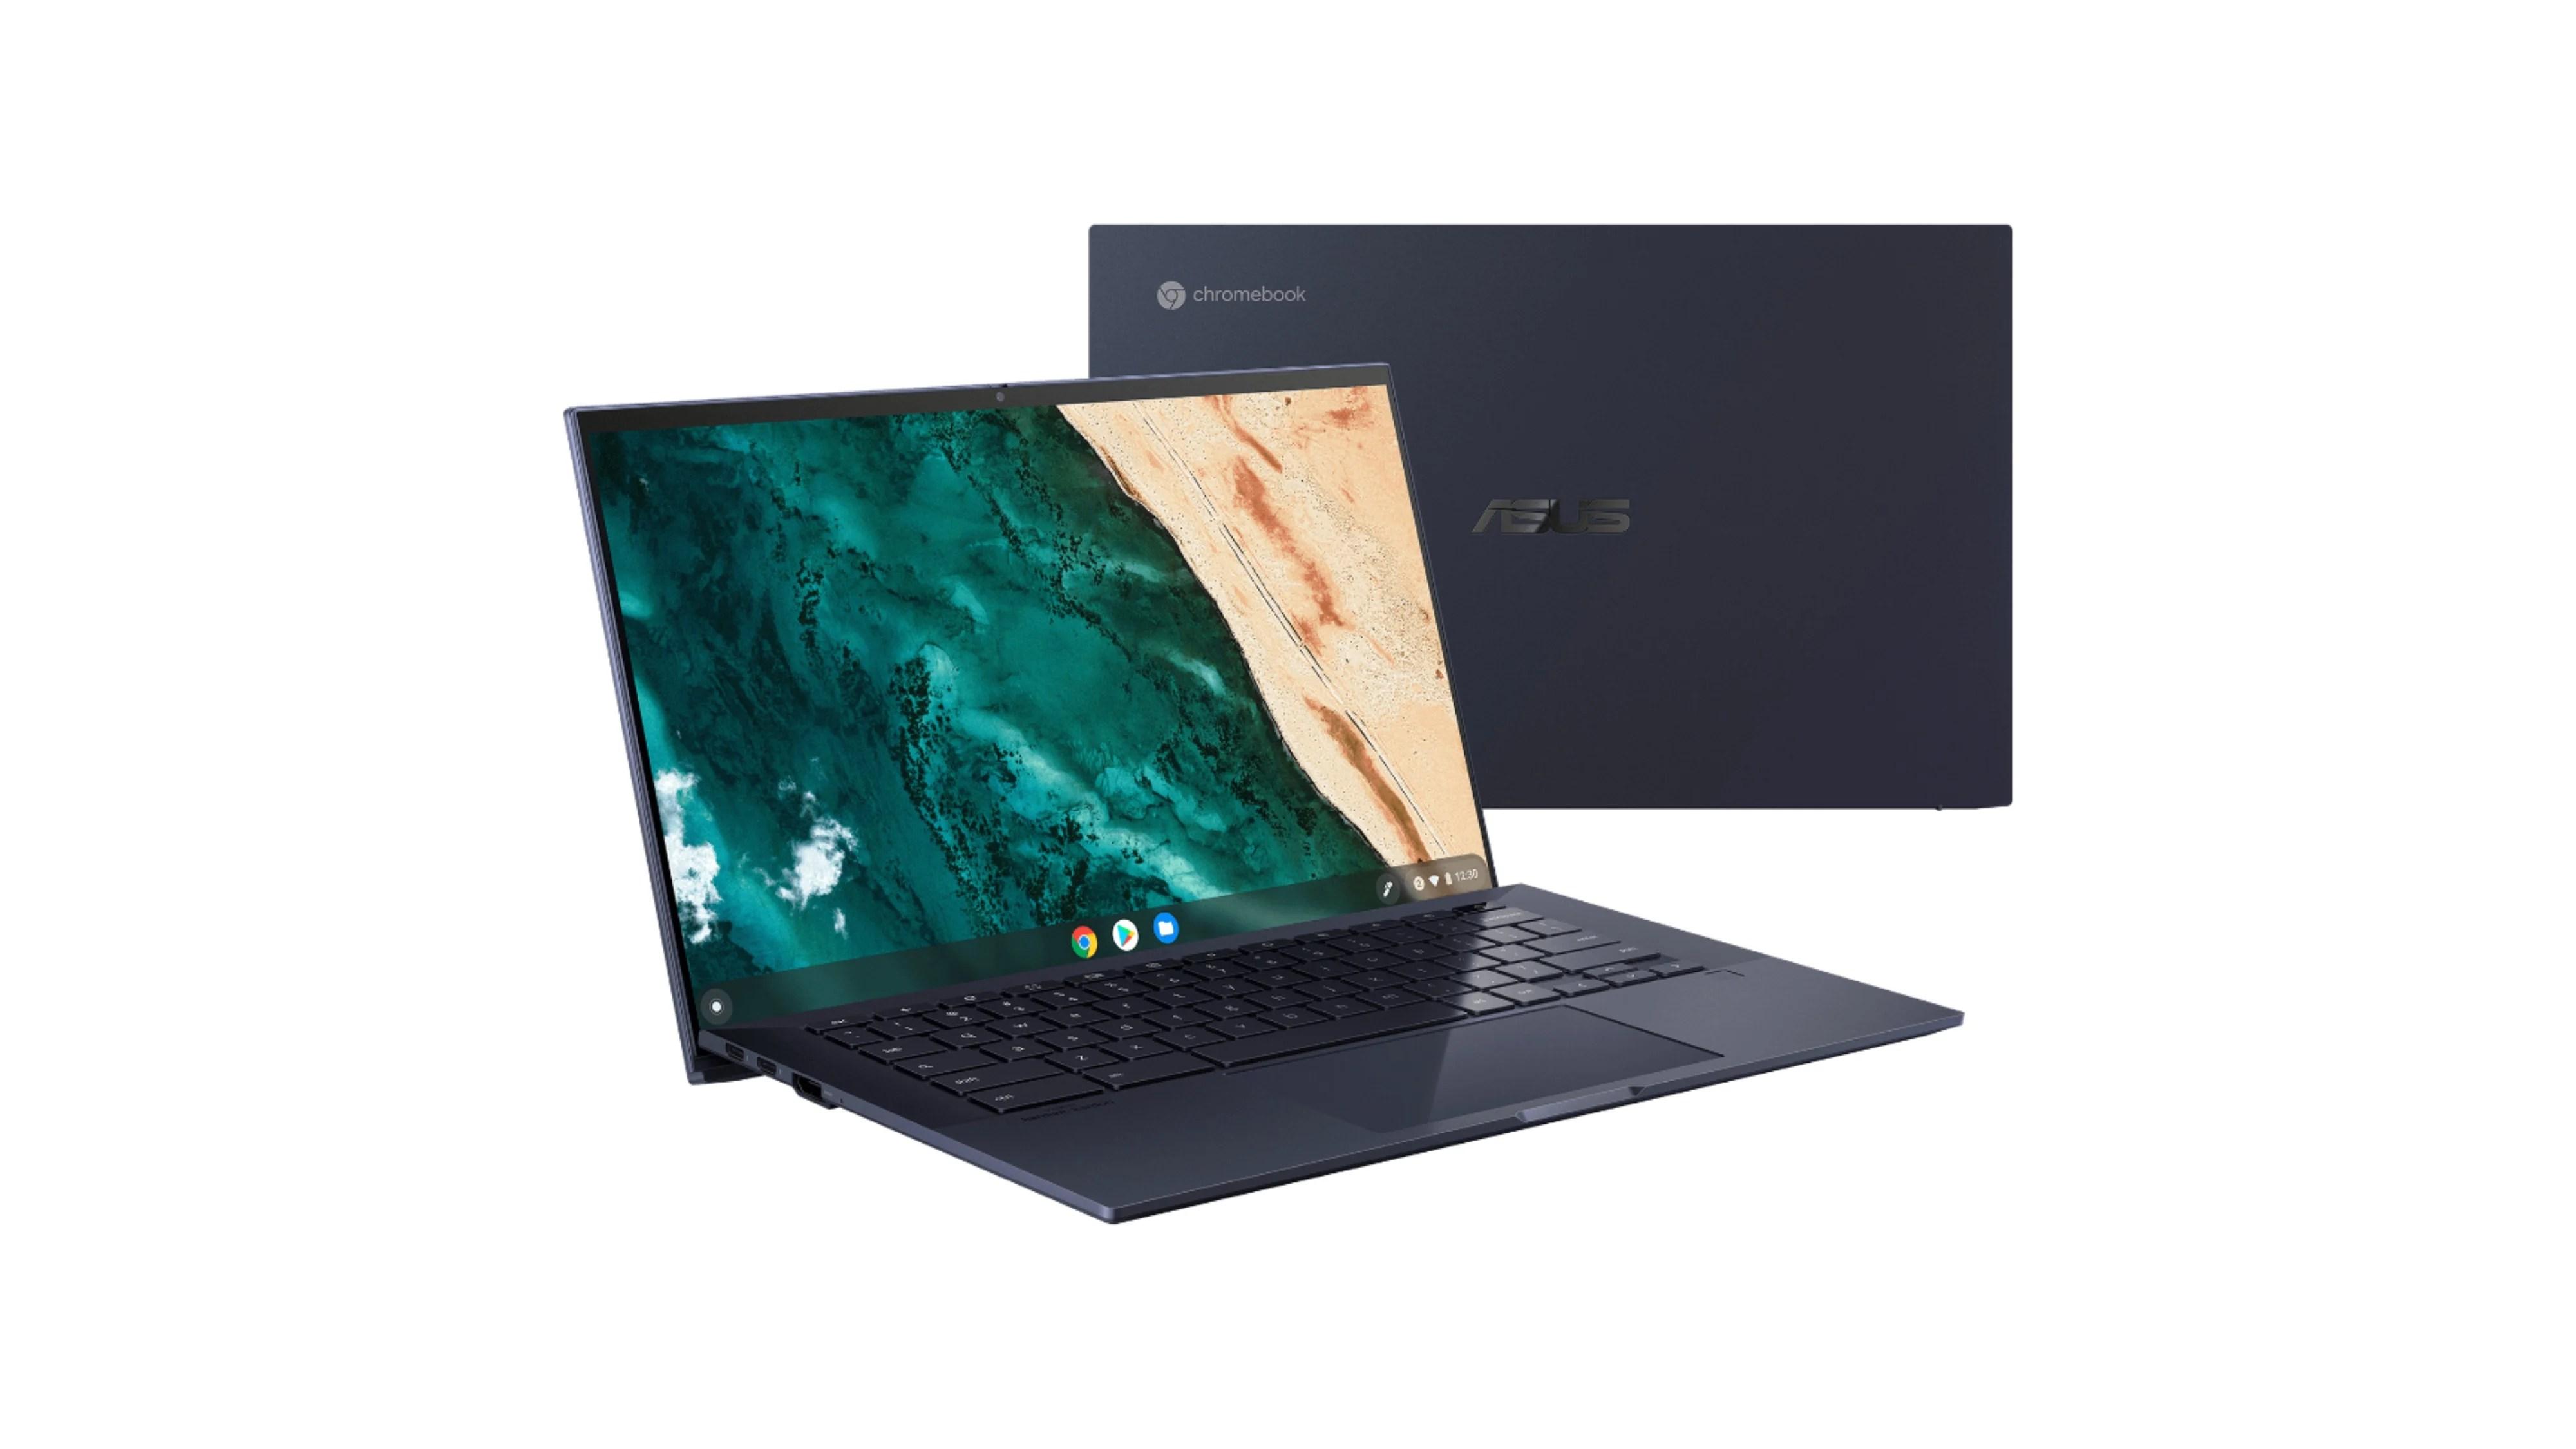 ASUS Chromebook CX9 Featured